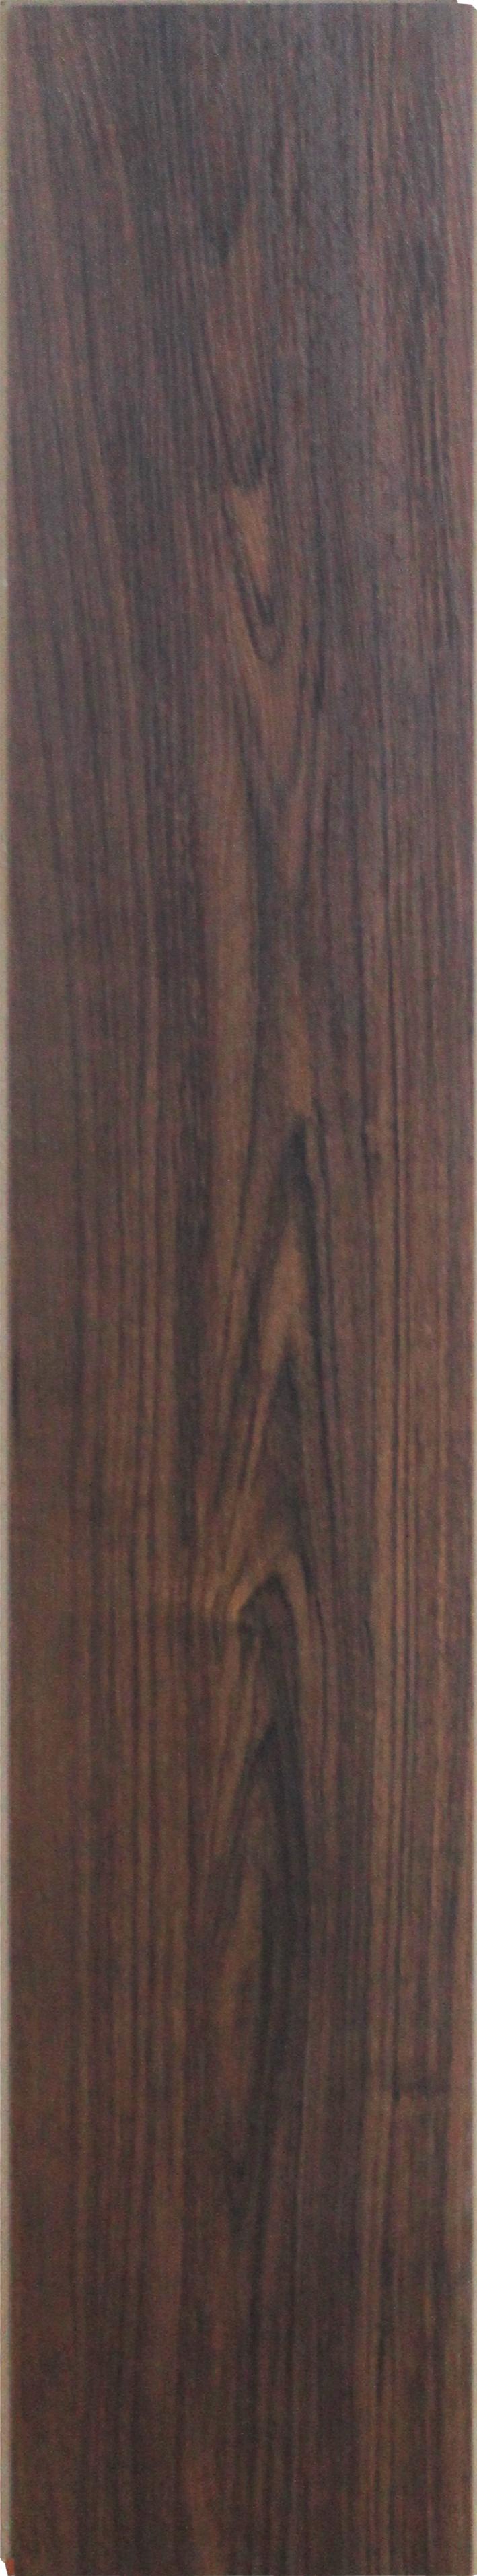 7630-London Walnut